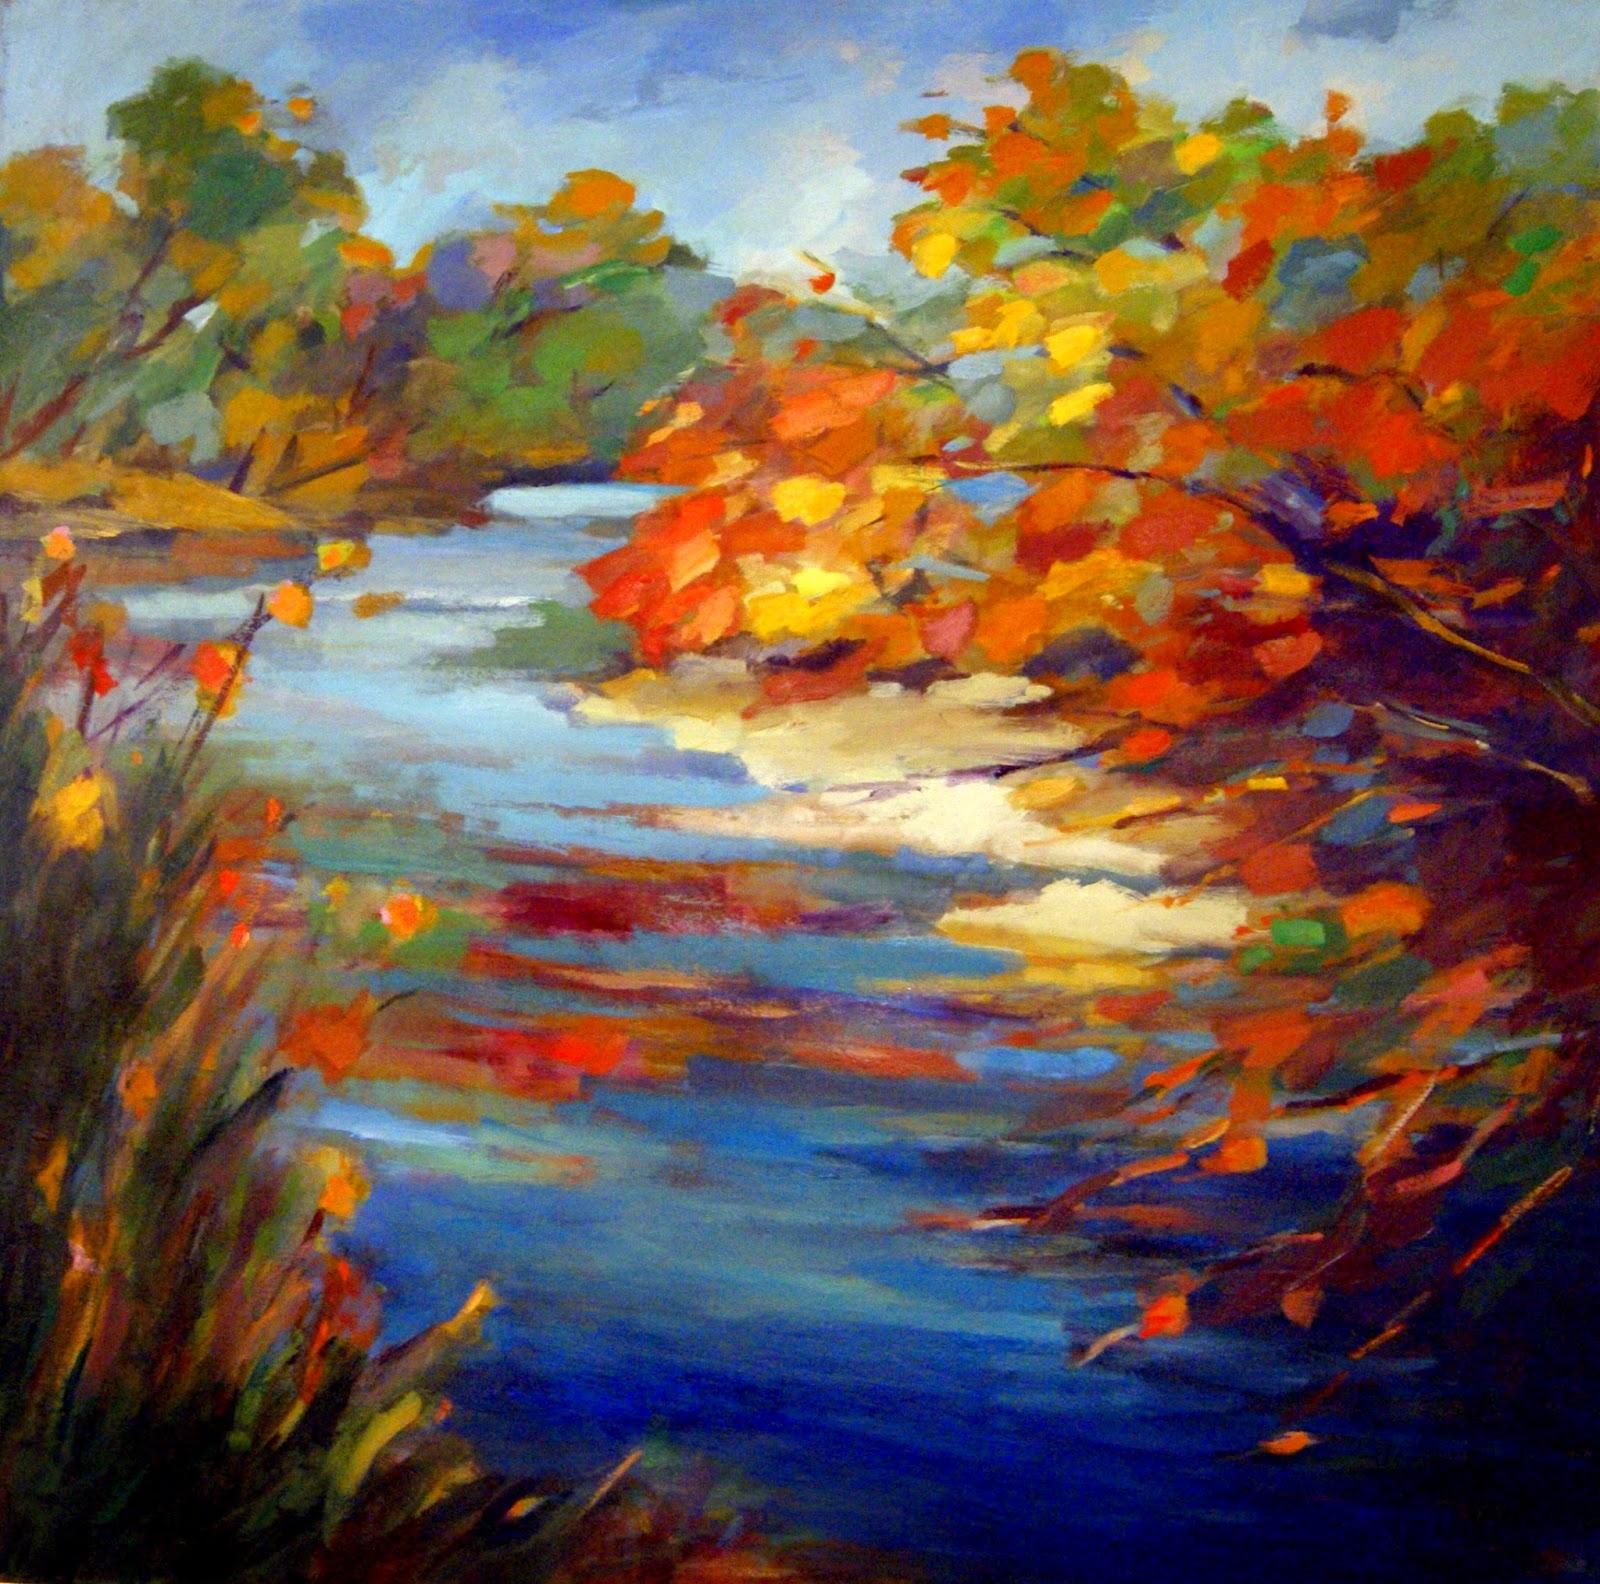 Abbas Darabi - Fall Creek